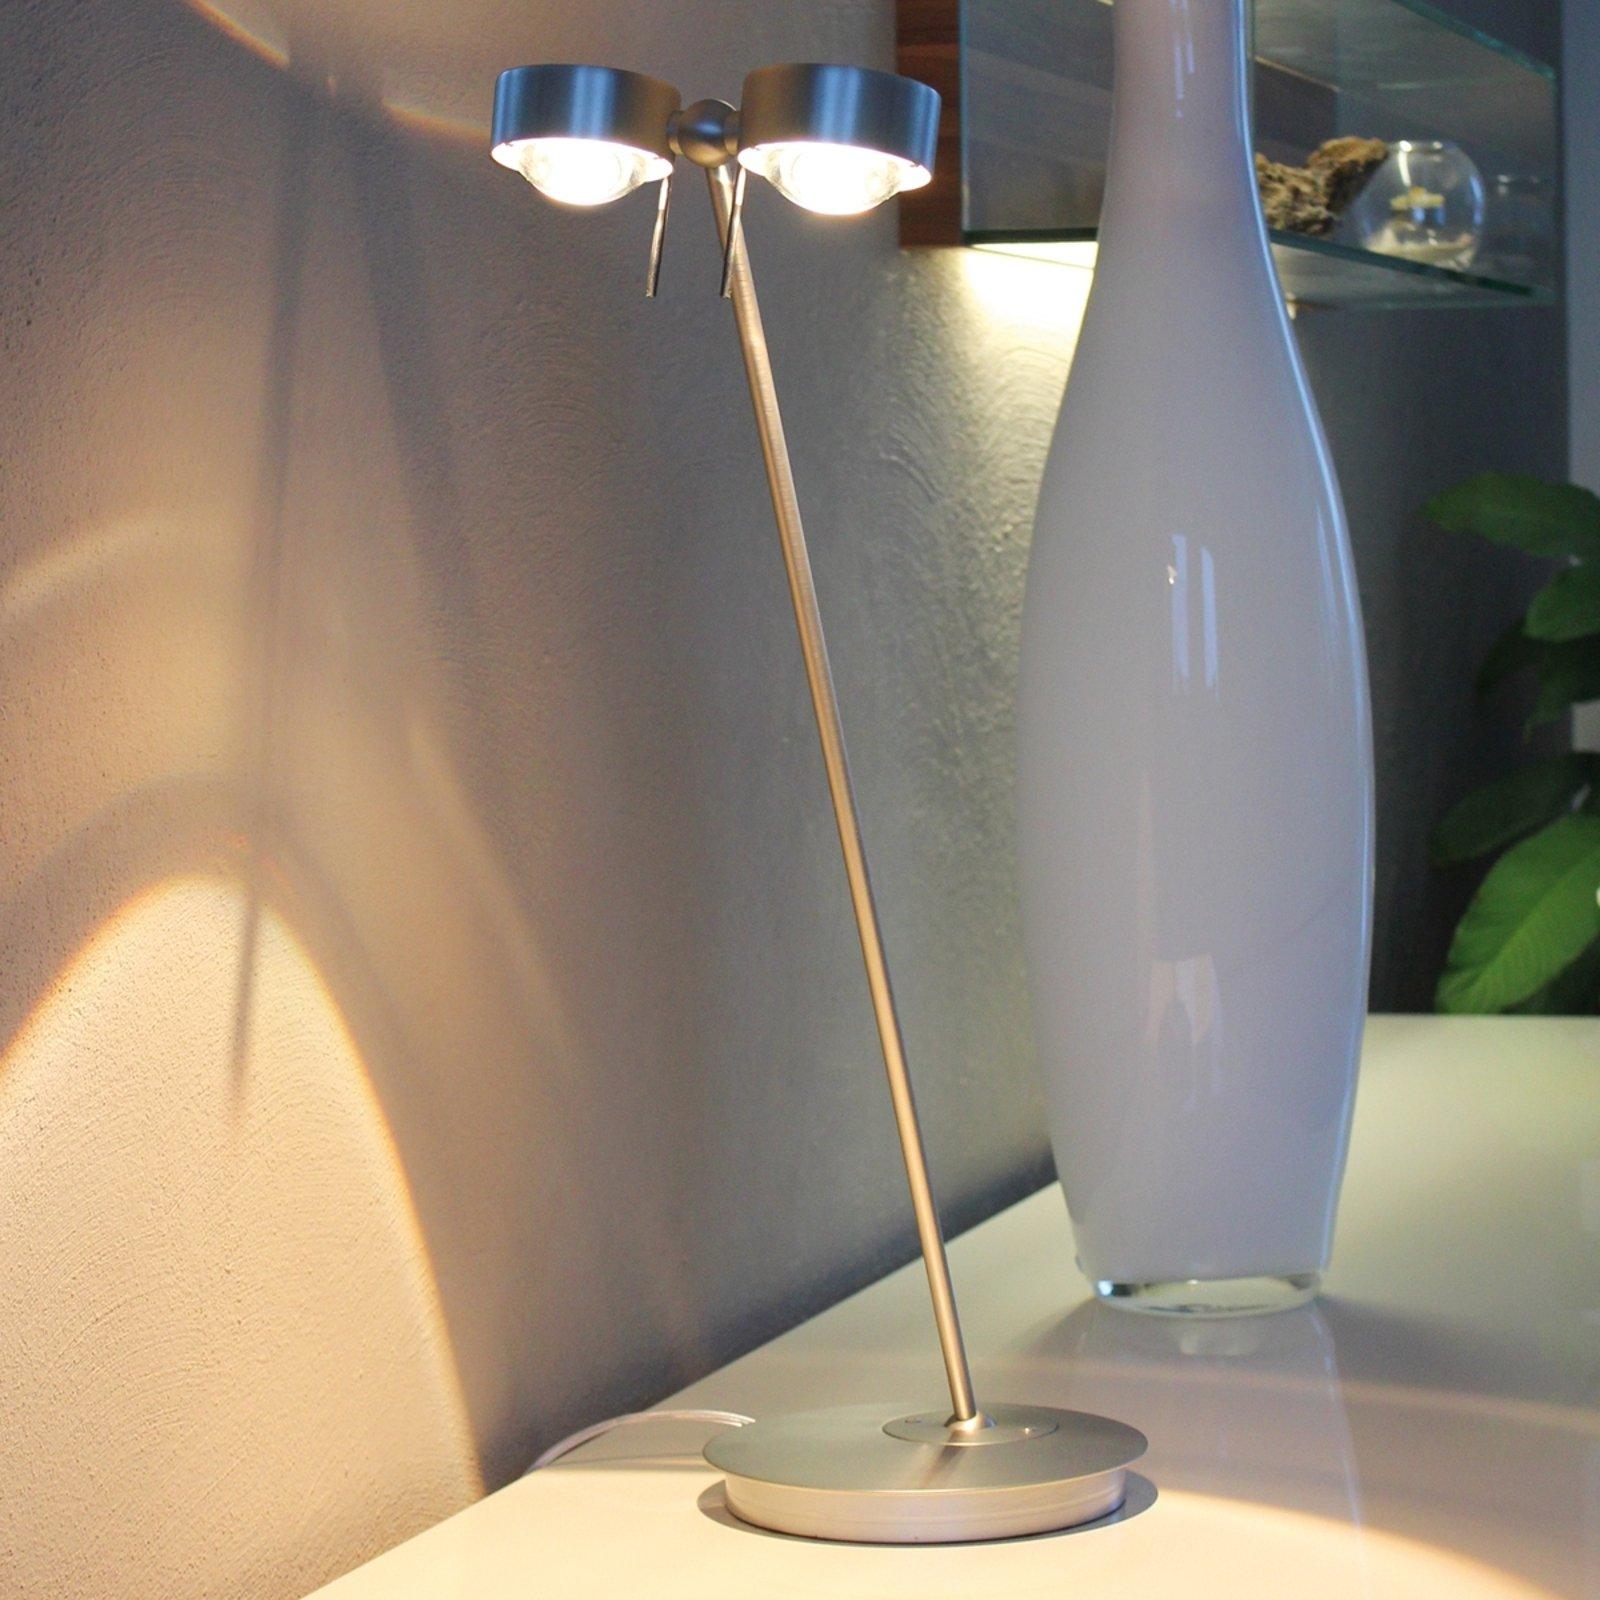 Bordlampe PUK TABLE matt krom 2 lyskilder